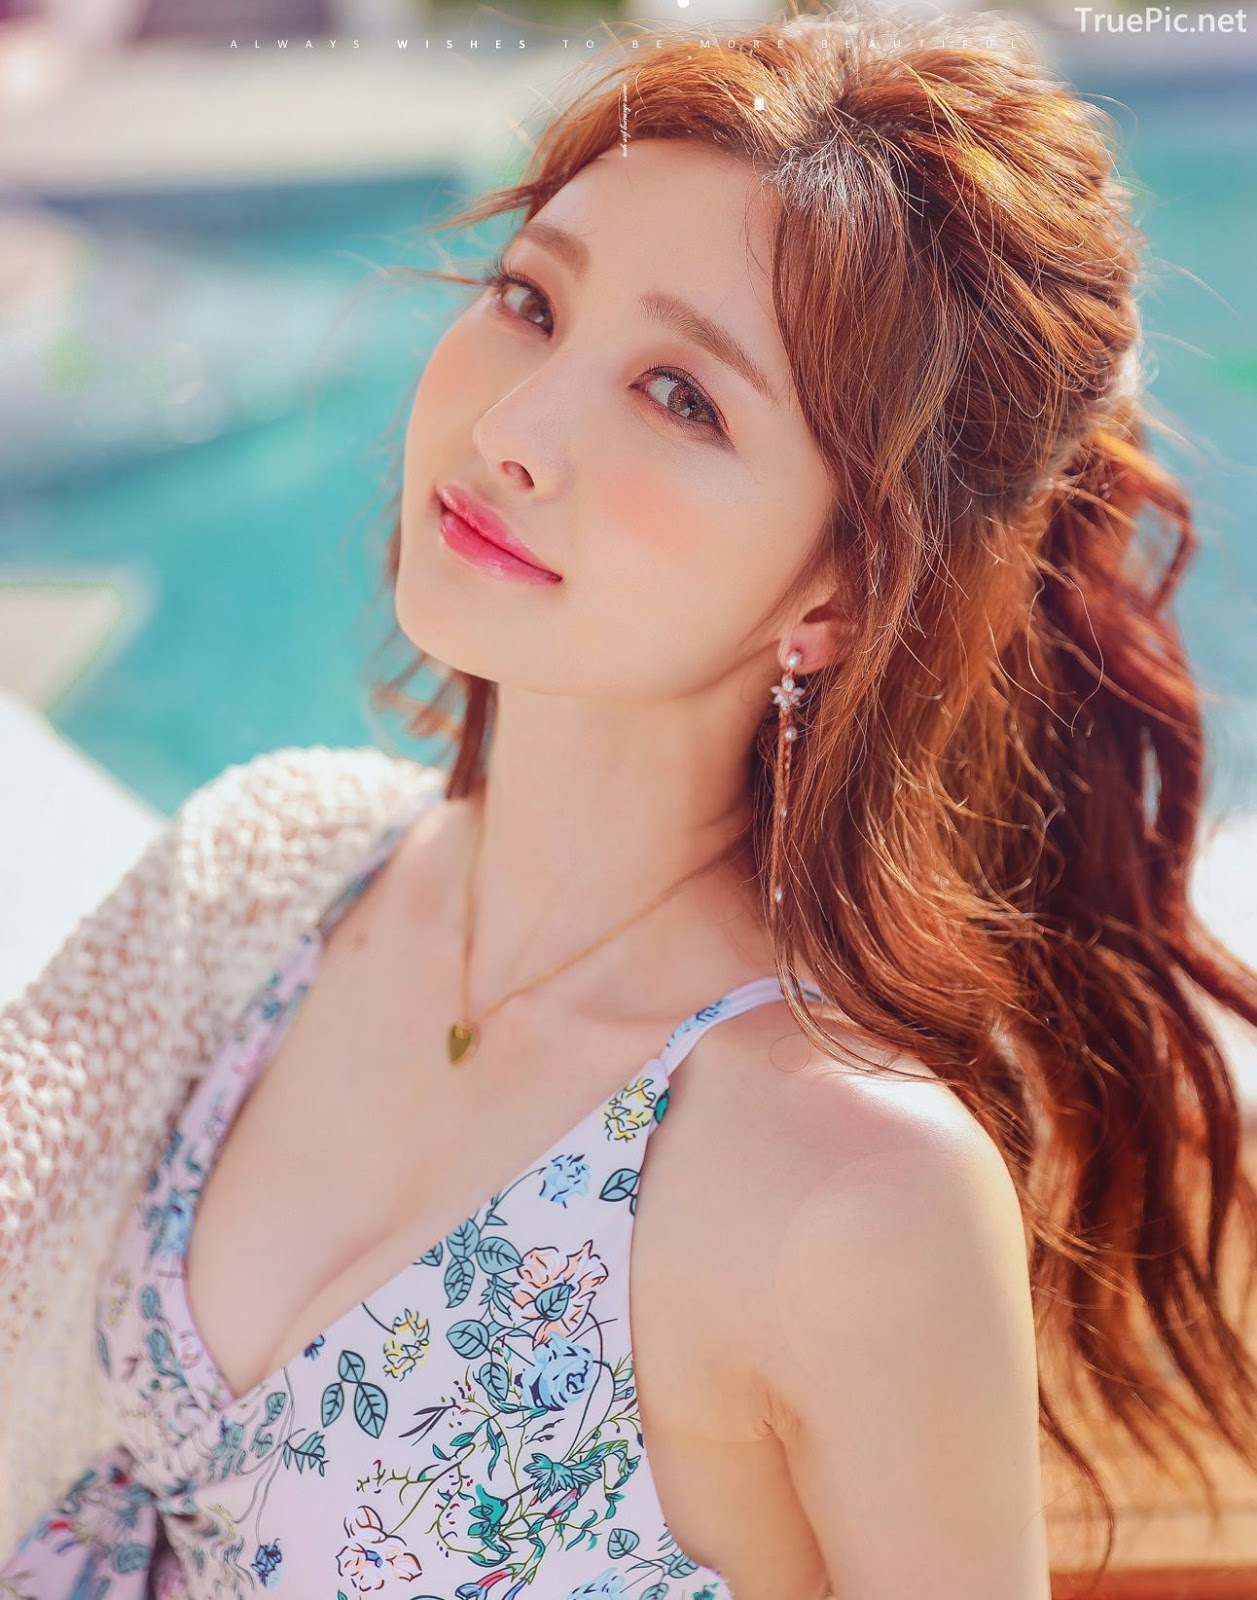 Korean lingerie queen Kim Hee Jeong - Floral Blue Monokini Swimsuit Set - Picture 6